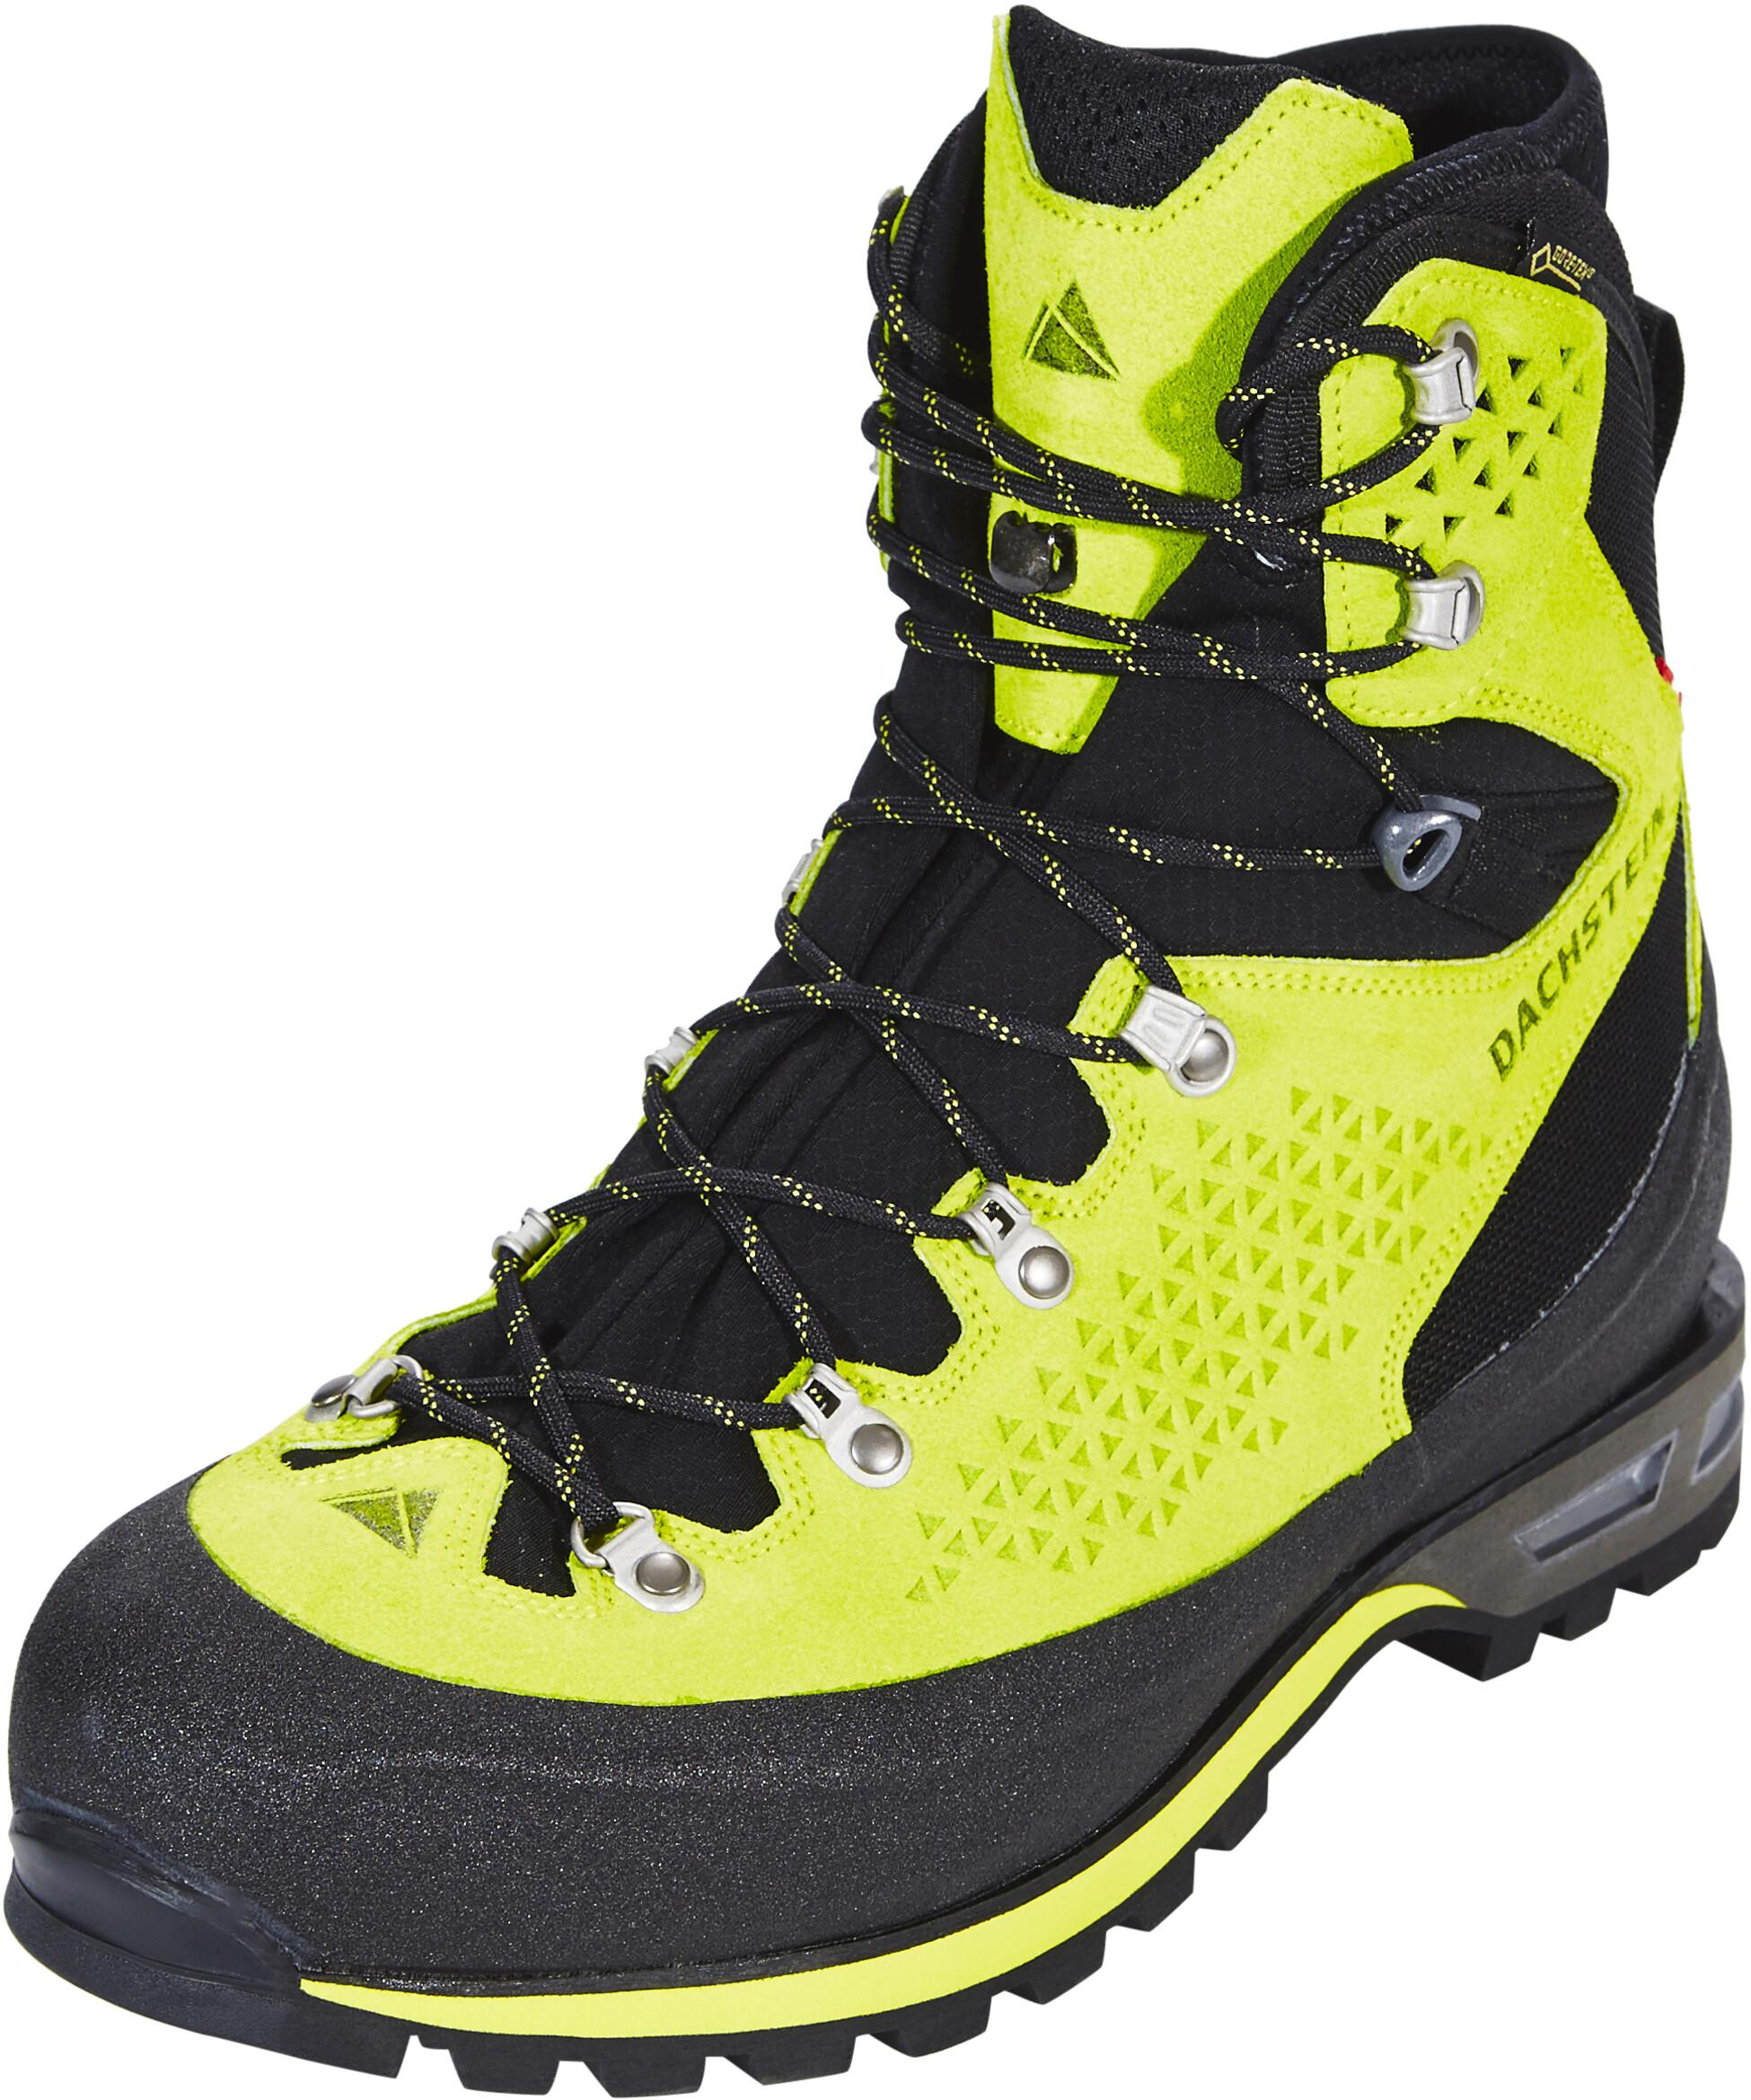 c05236a715fb Dachstein Stüdlgrat GTX Boots Men black/sulphur at Addnature.co.uk